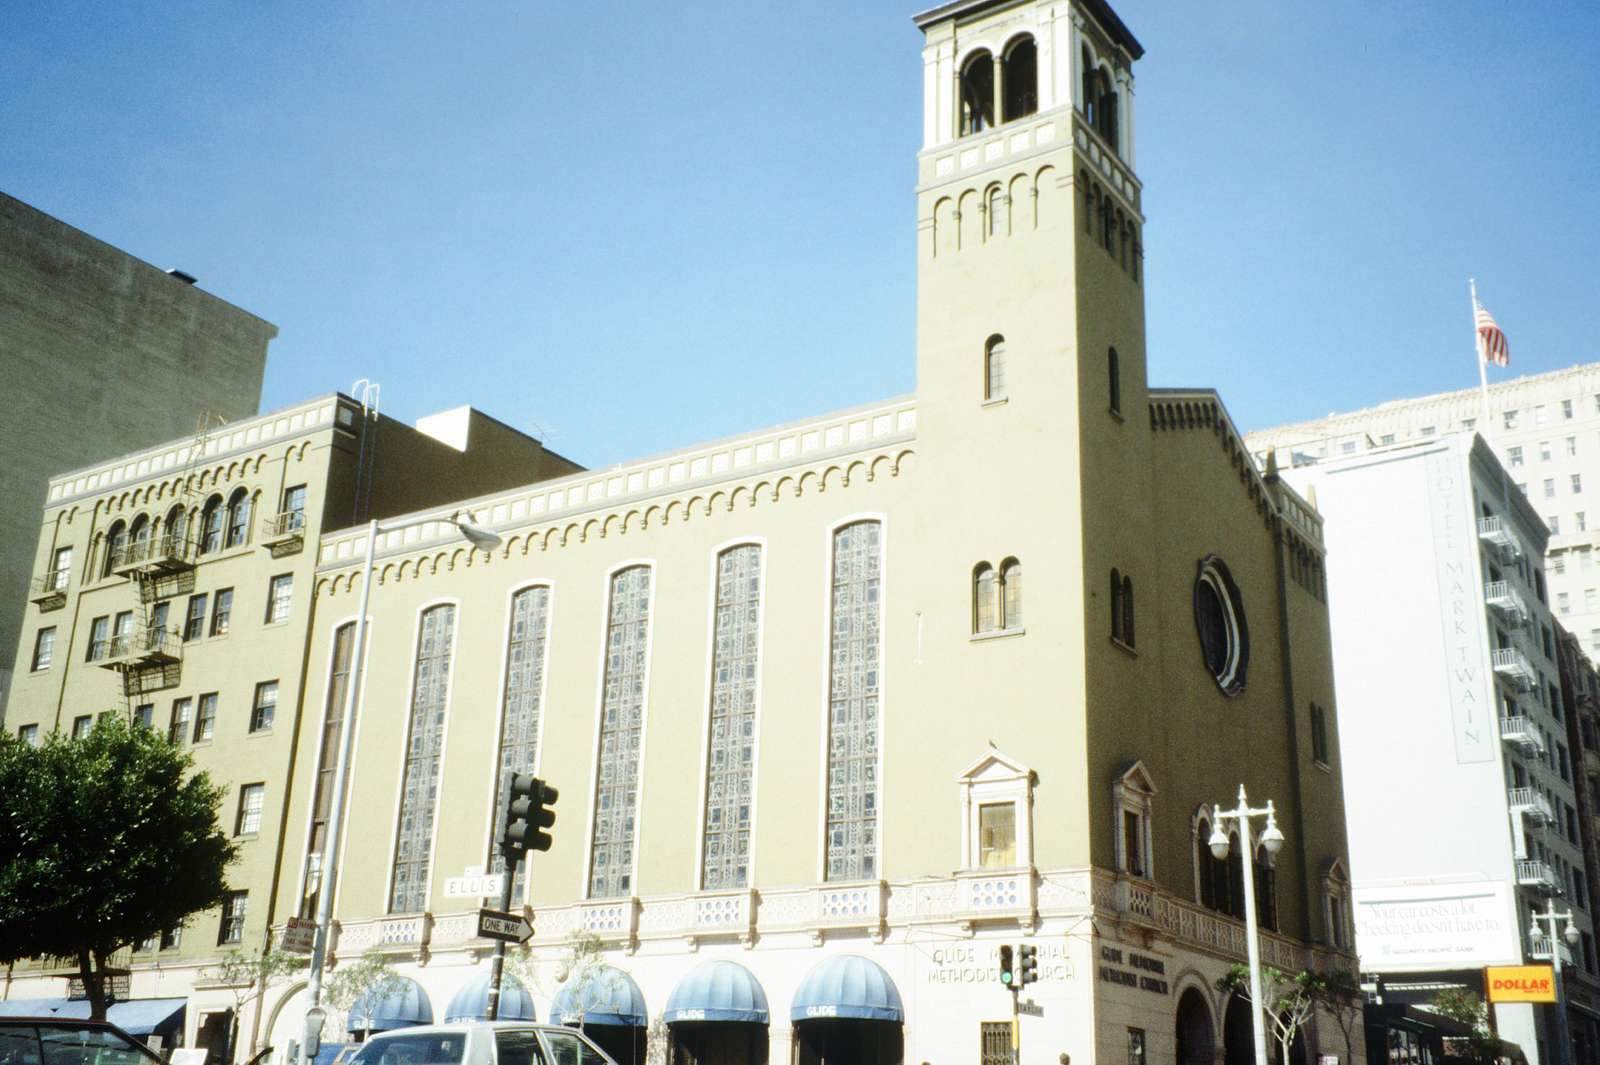 Glide Memorial United Methodist Church, renovation, San Francisco, CA